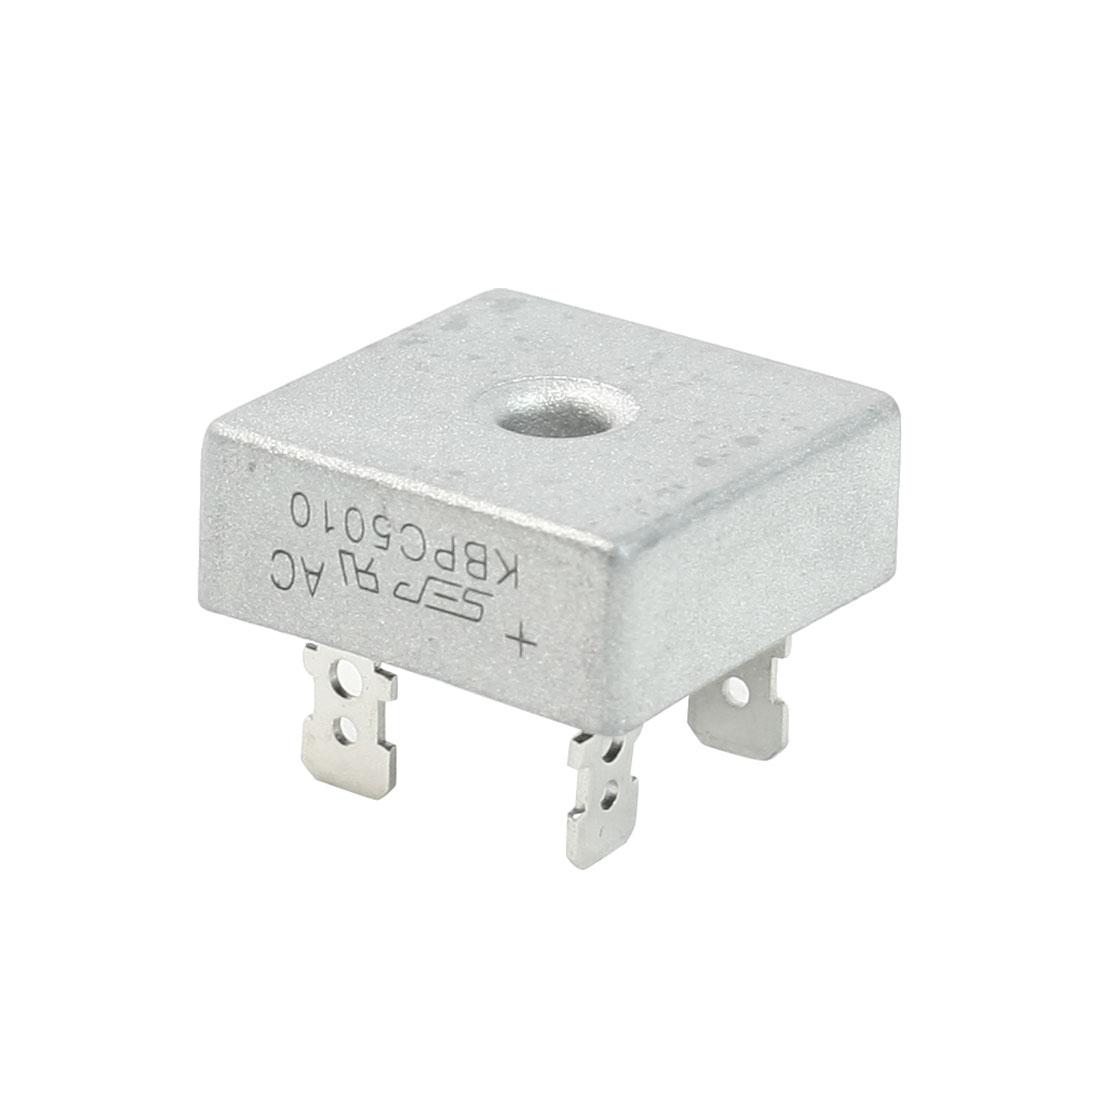 KBPC50-10 1KV 50Amp Silver Tone Metal Case Single Phase Bridge Rectifier